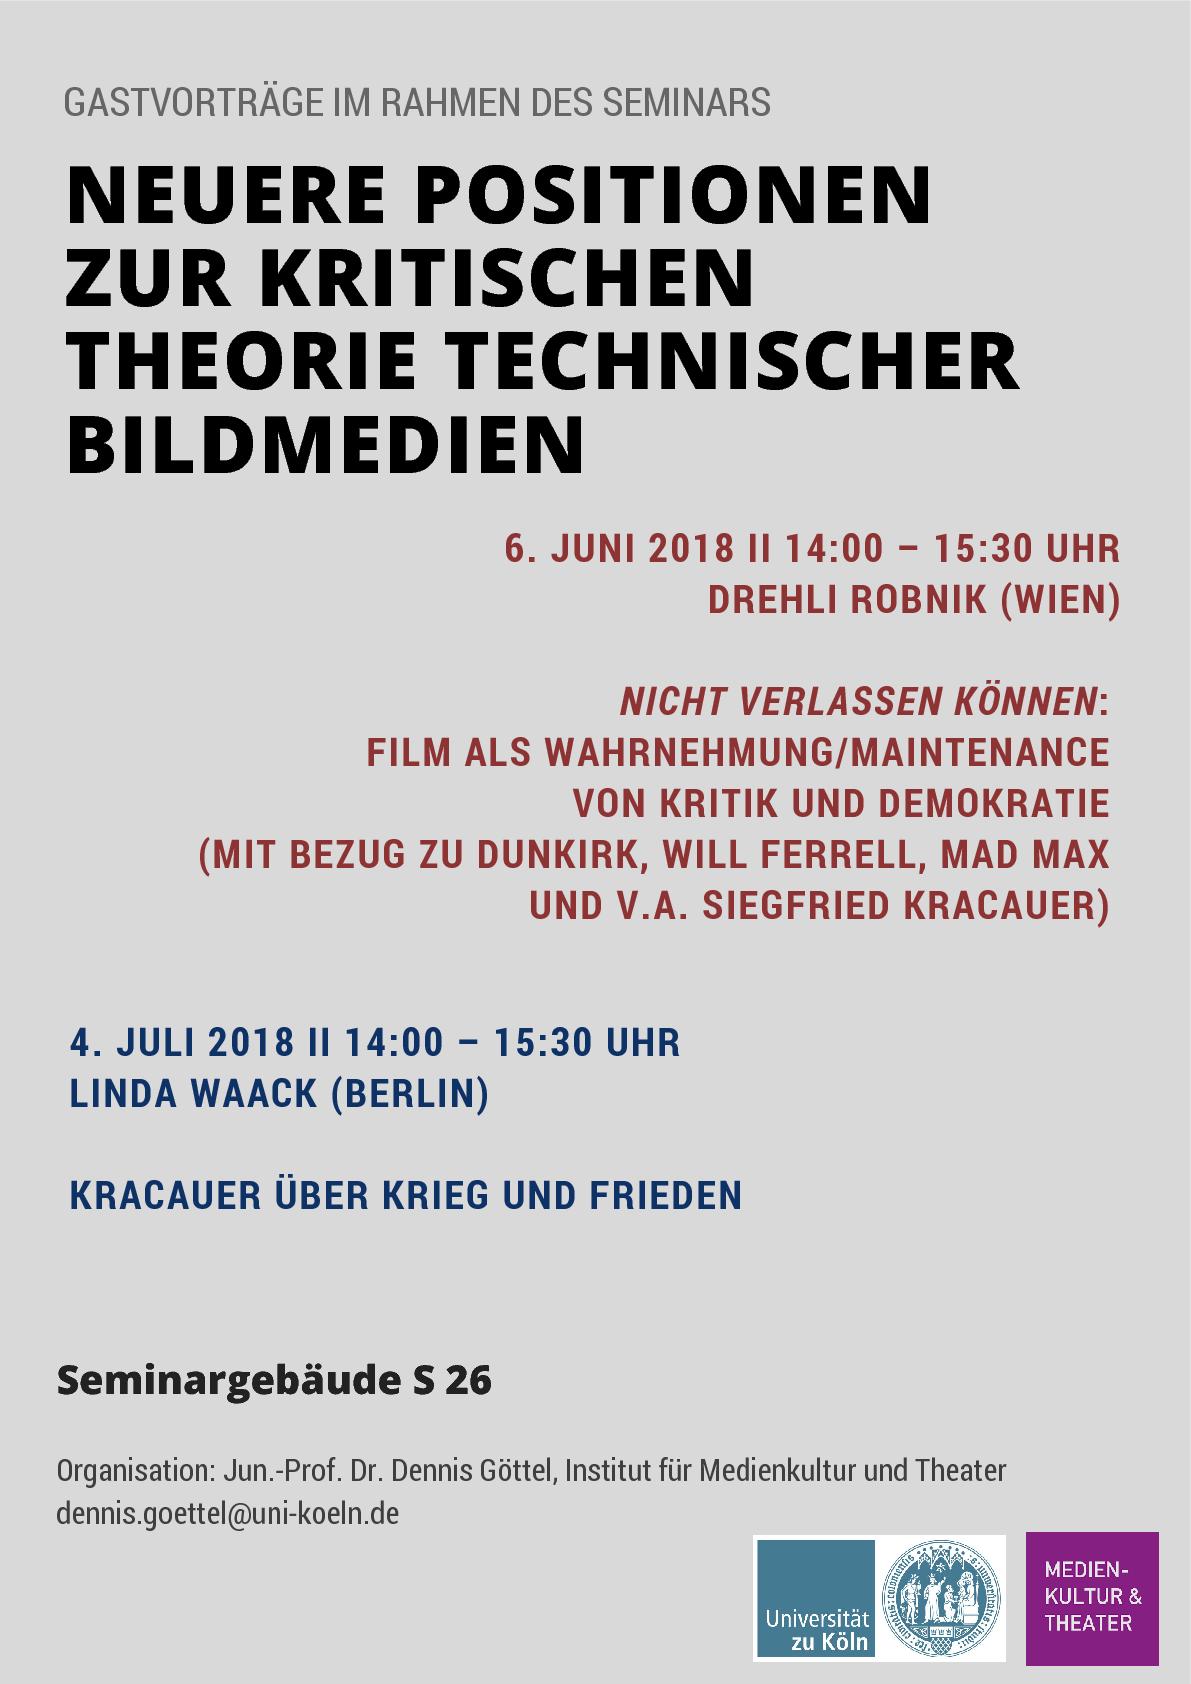 Charmant Bilderrahmen Theater Ideen - Rahmen Ideen - markjohnsonshow ...